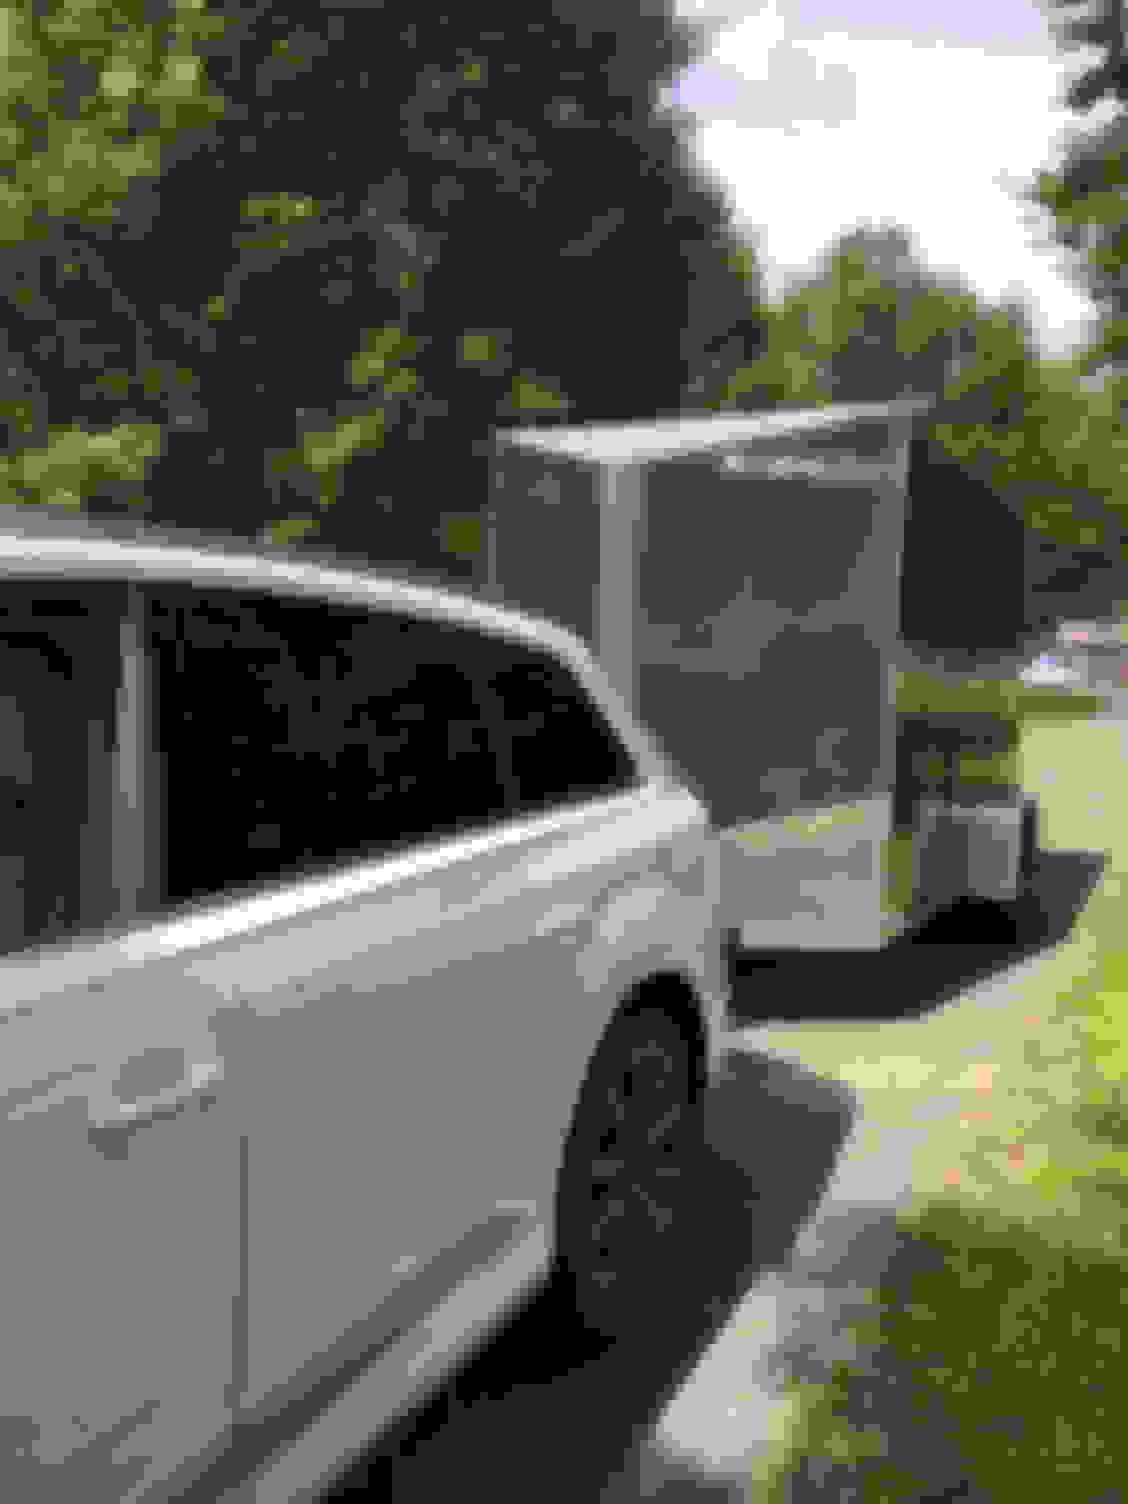 Towing U-Haul 5'x8' - AudiWorld Forums